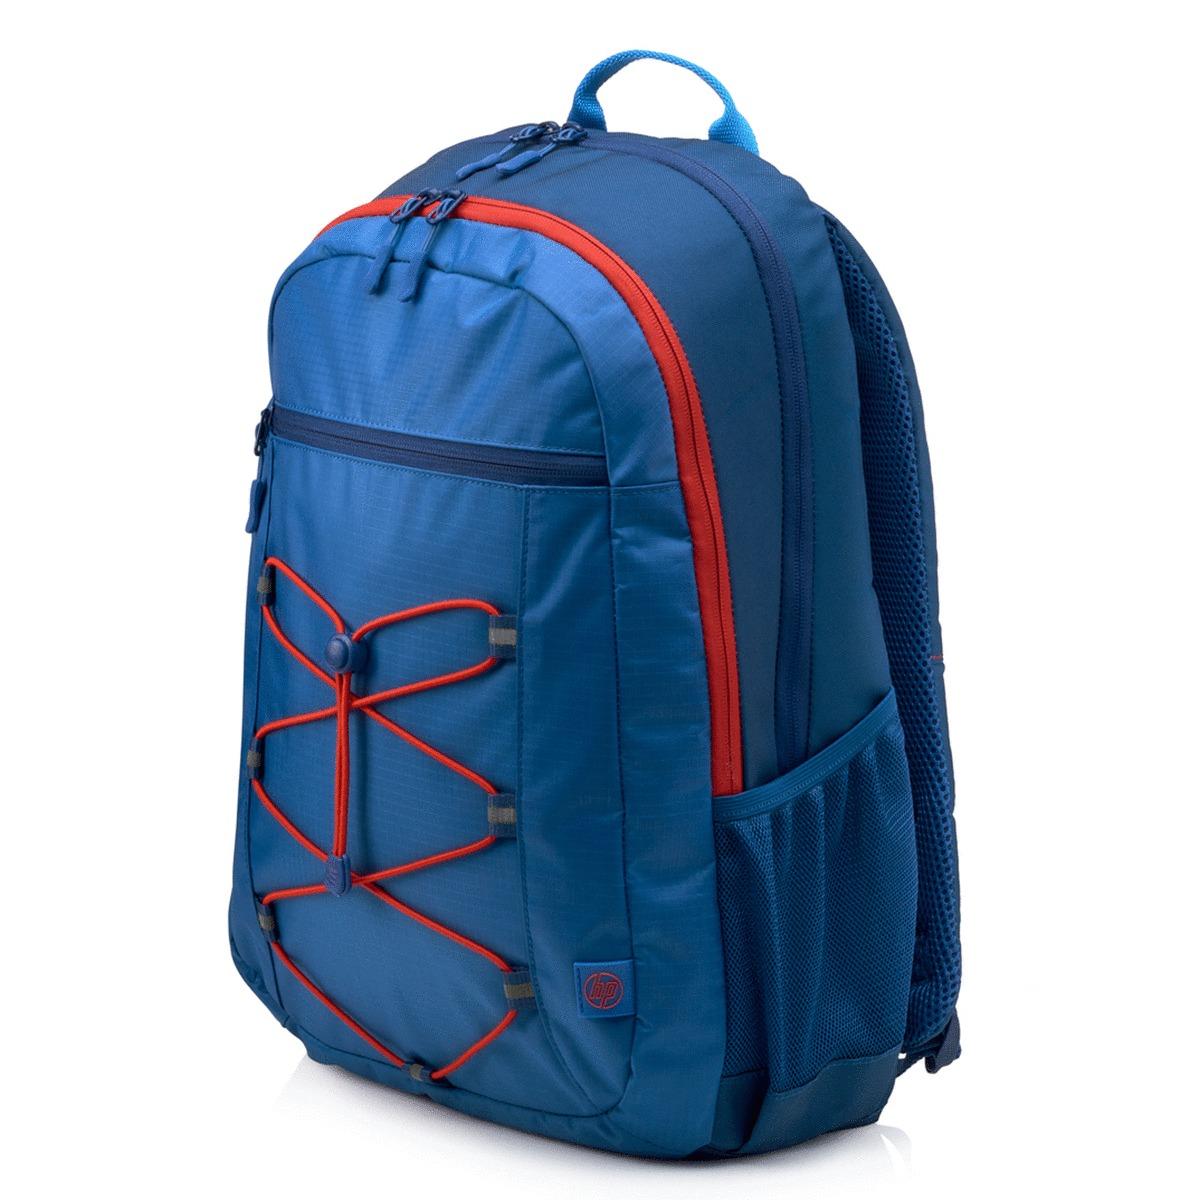 Office Depot: Mochila HP Active 15.6 pulgadas, azul descuentazo!!